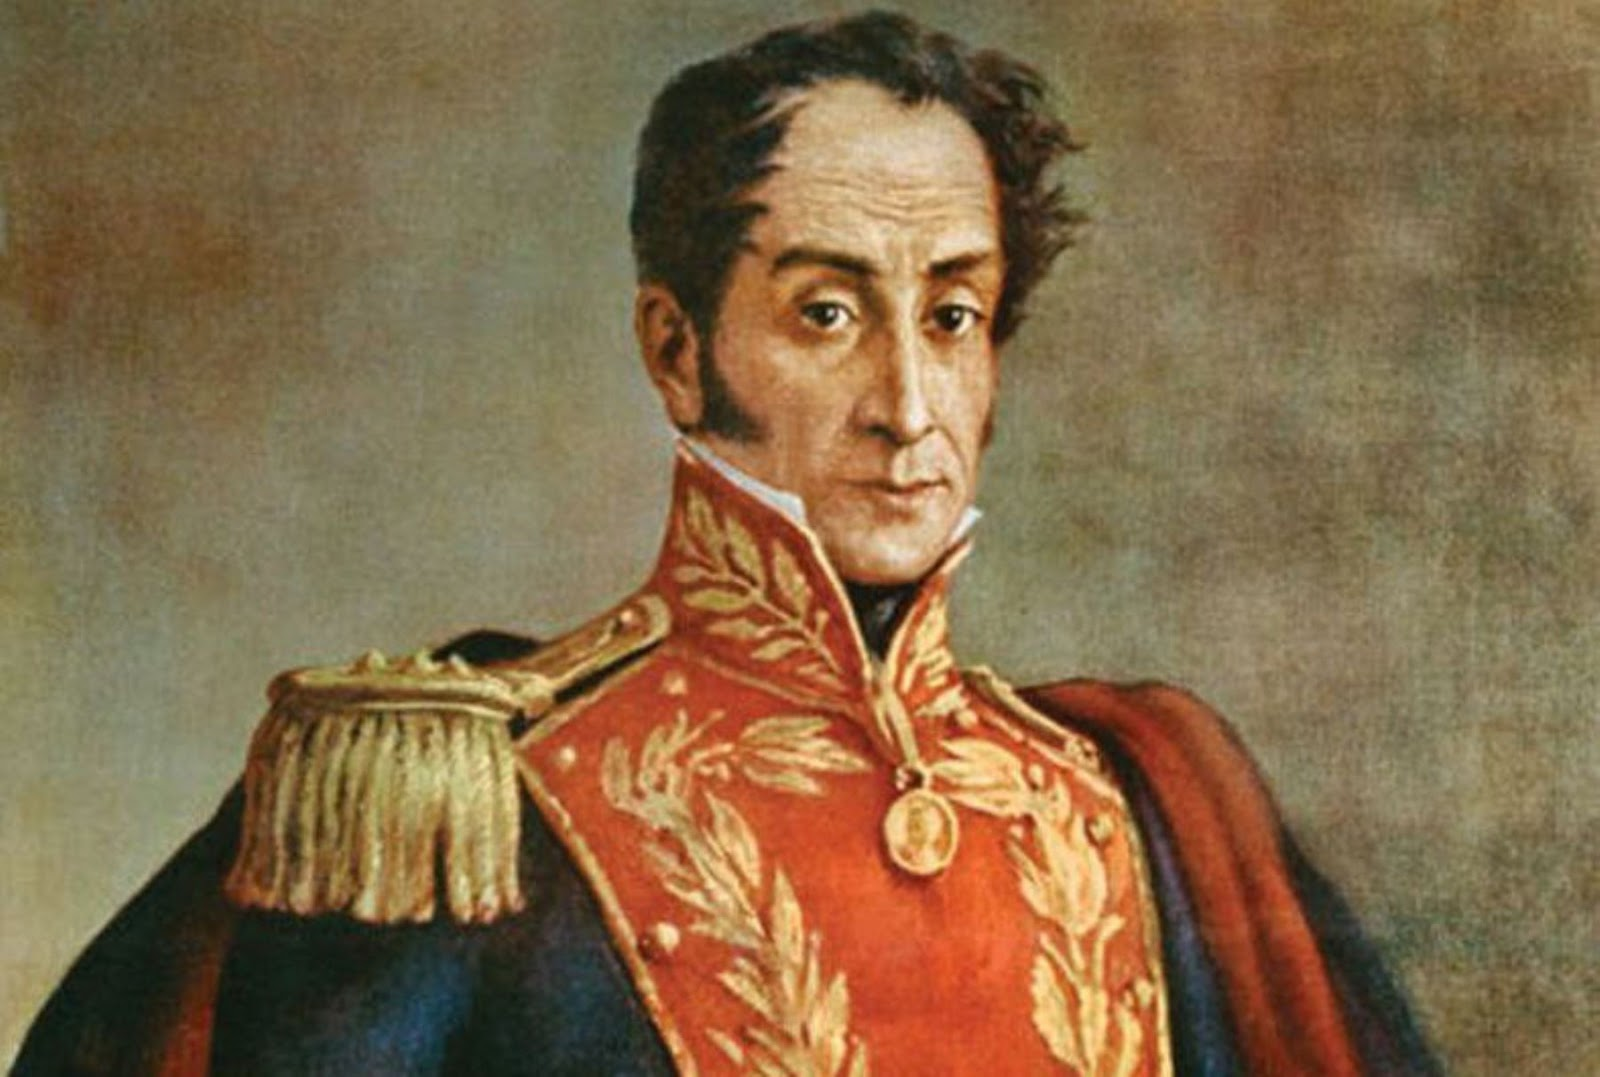 simon bolivar Noun: 1 simon bolivar - venezuelan statesman who led the revolt of south american colonies against spanish rule founded bolivia in 1825 (1783-1830.